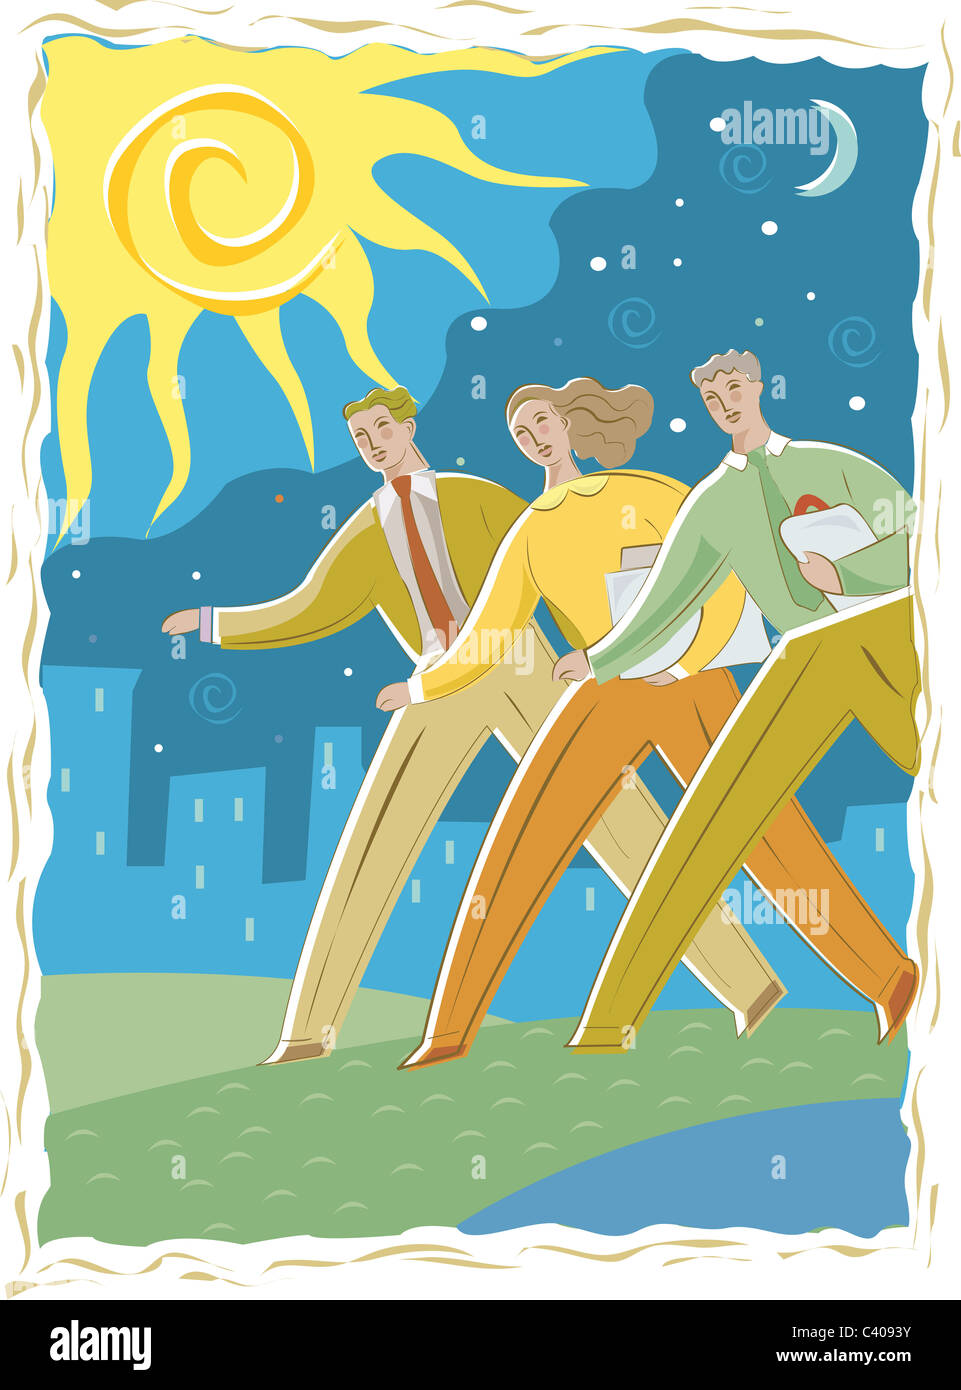 Illustration of three business people - Stock Image